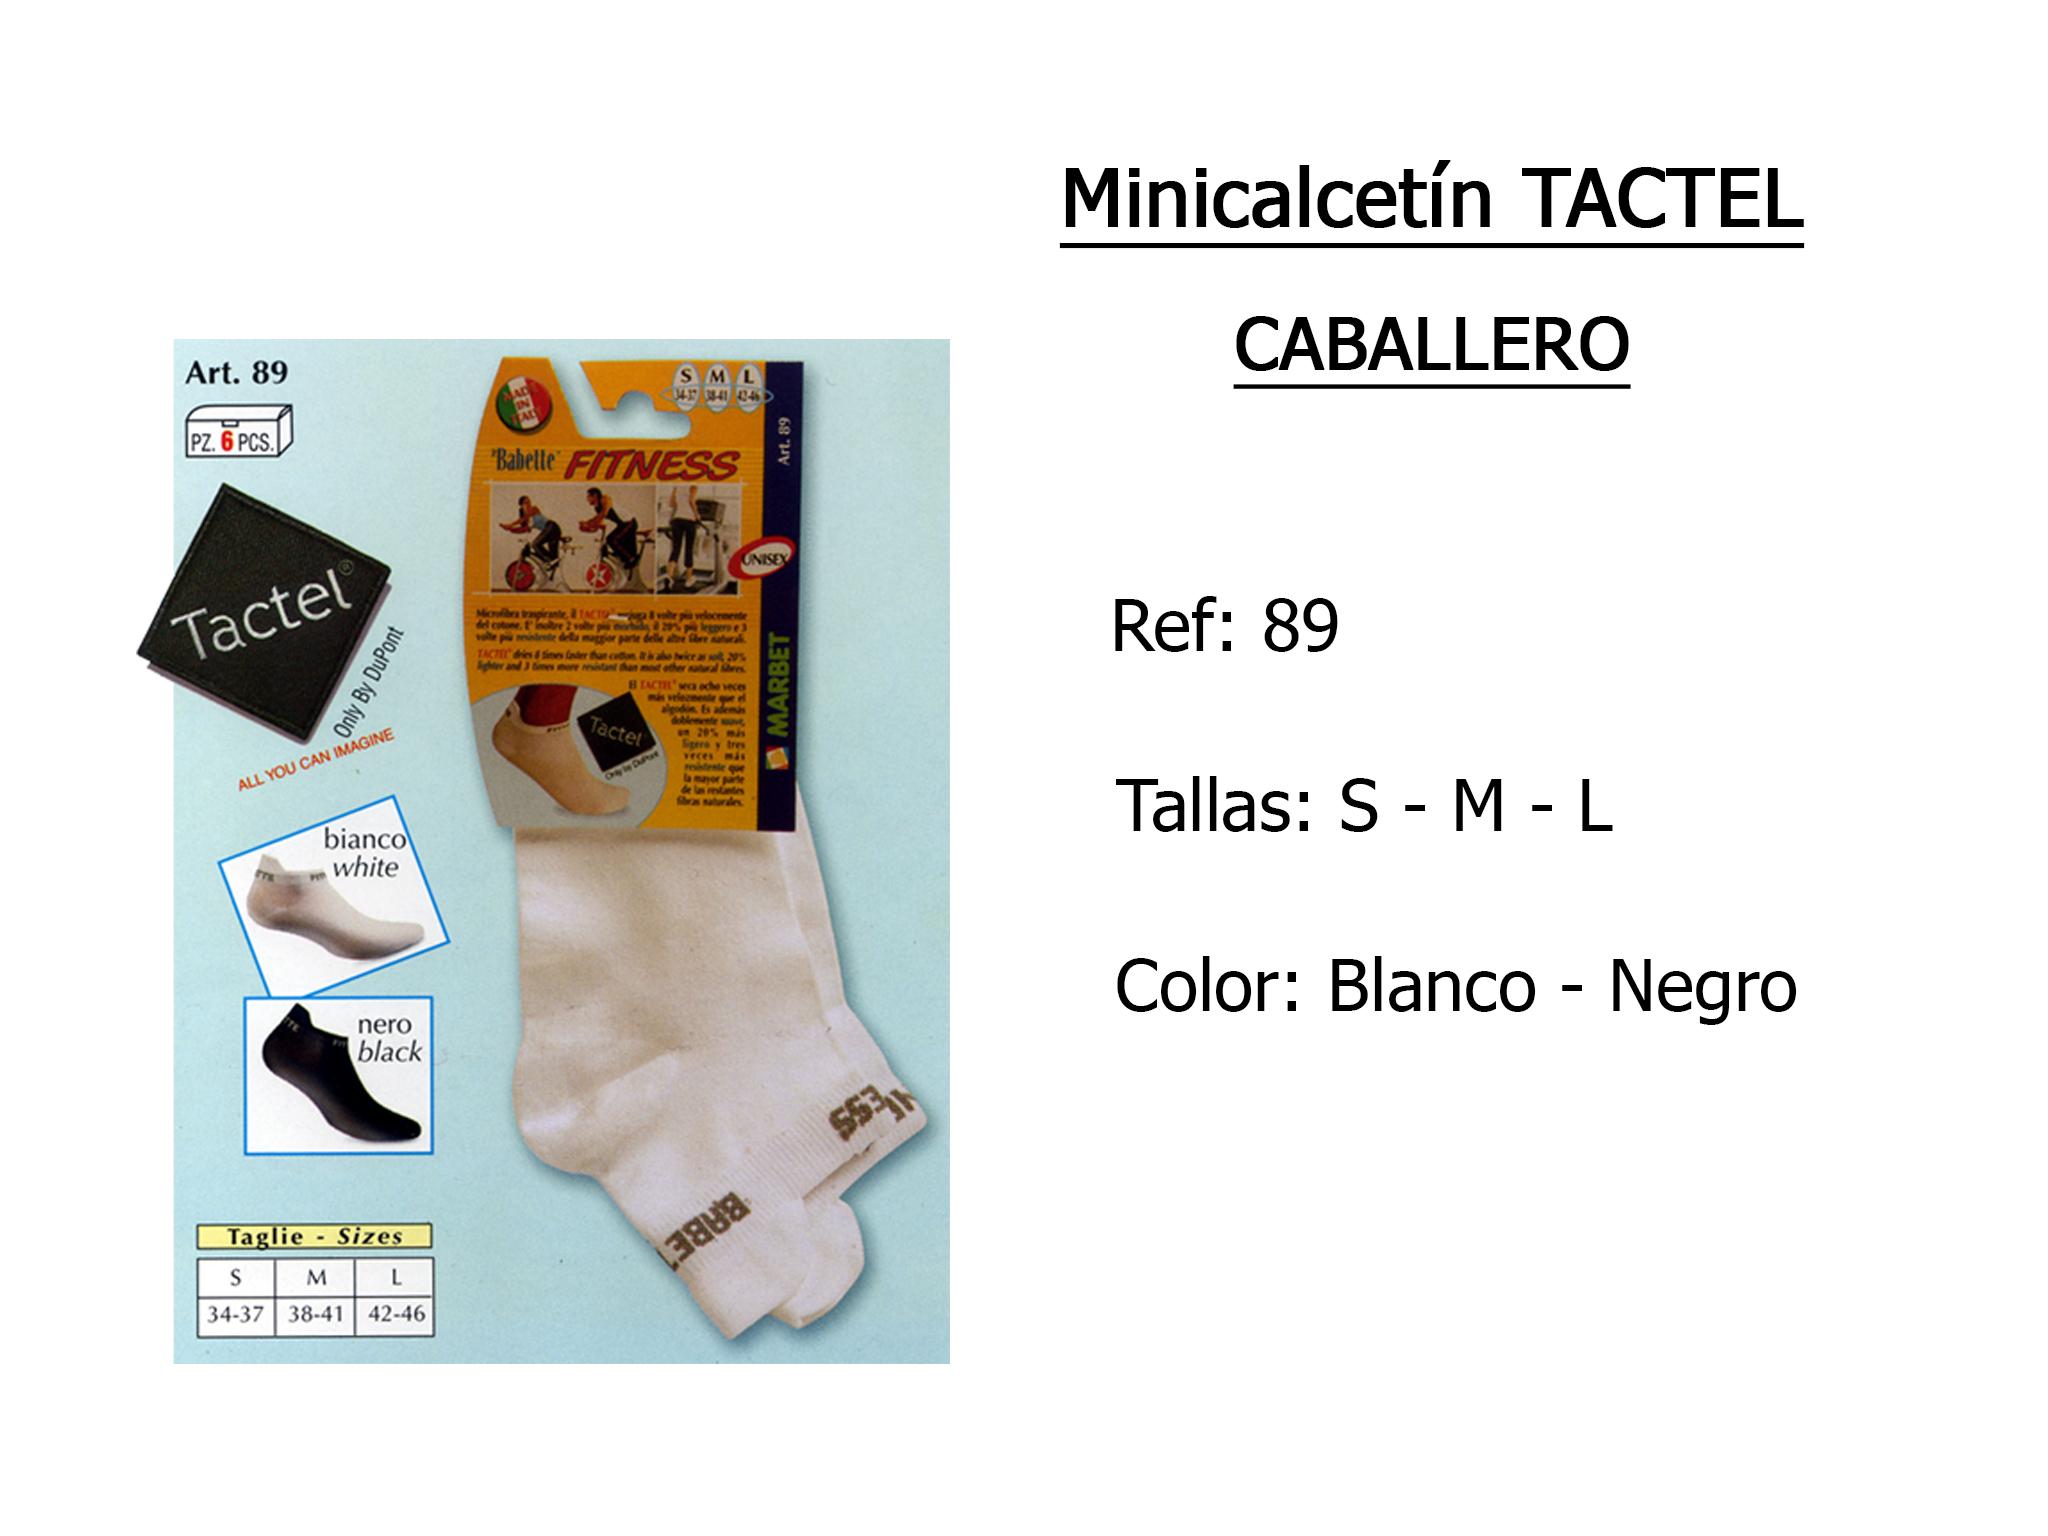 MINICALCETIN tactel caballero 89